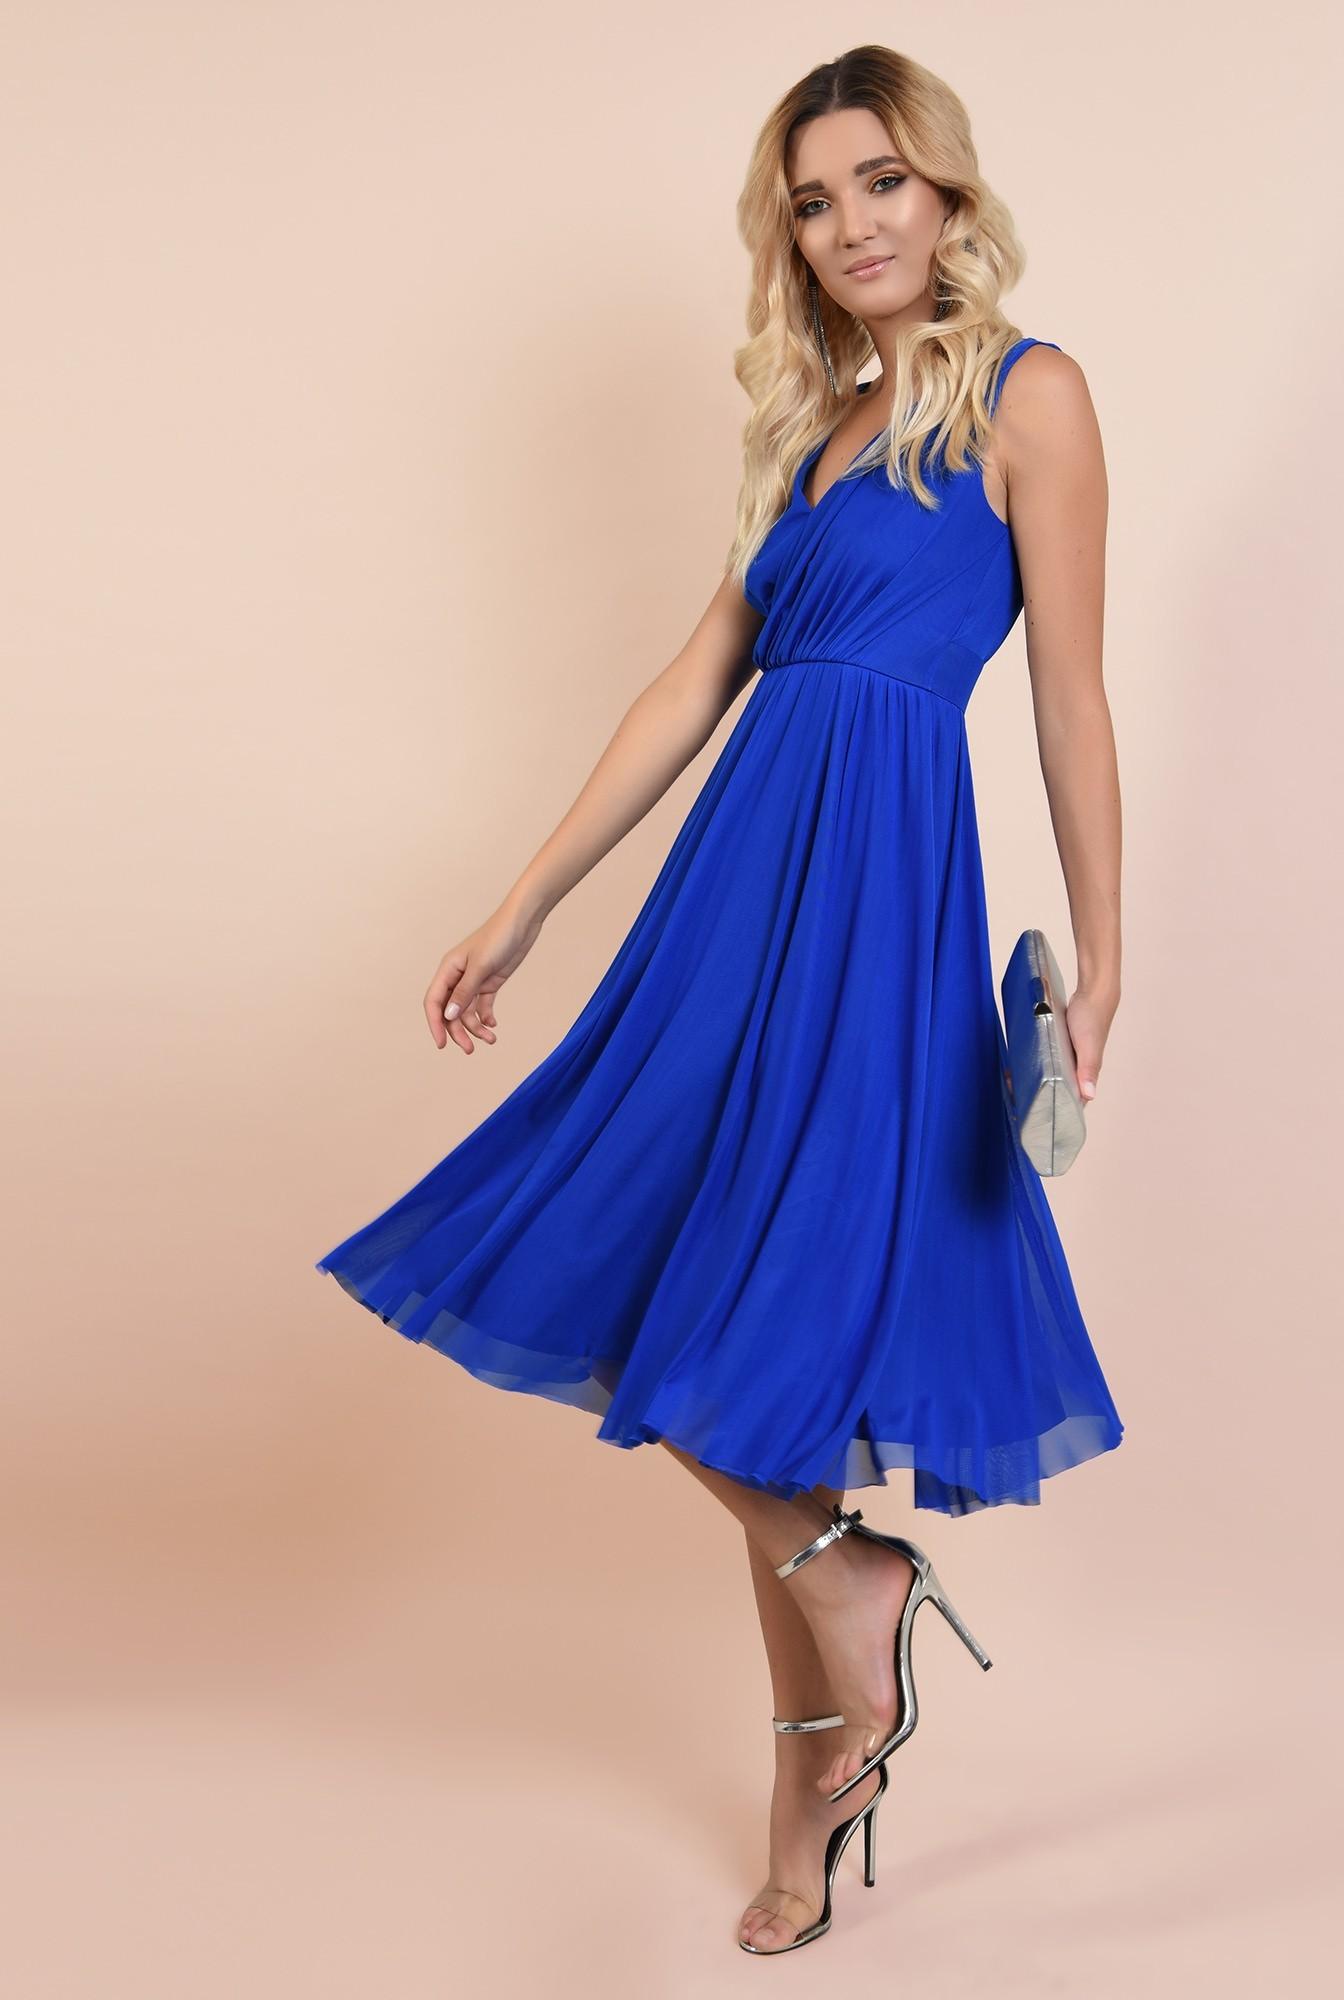 0 - rochie de seara, albastra, tul, decolteu petrecut, Poema, clos